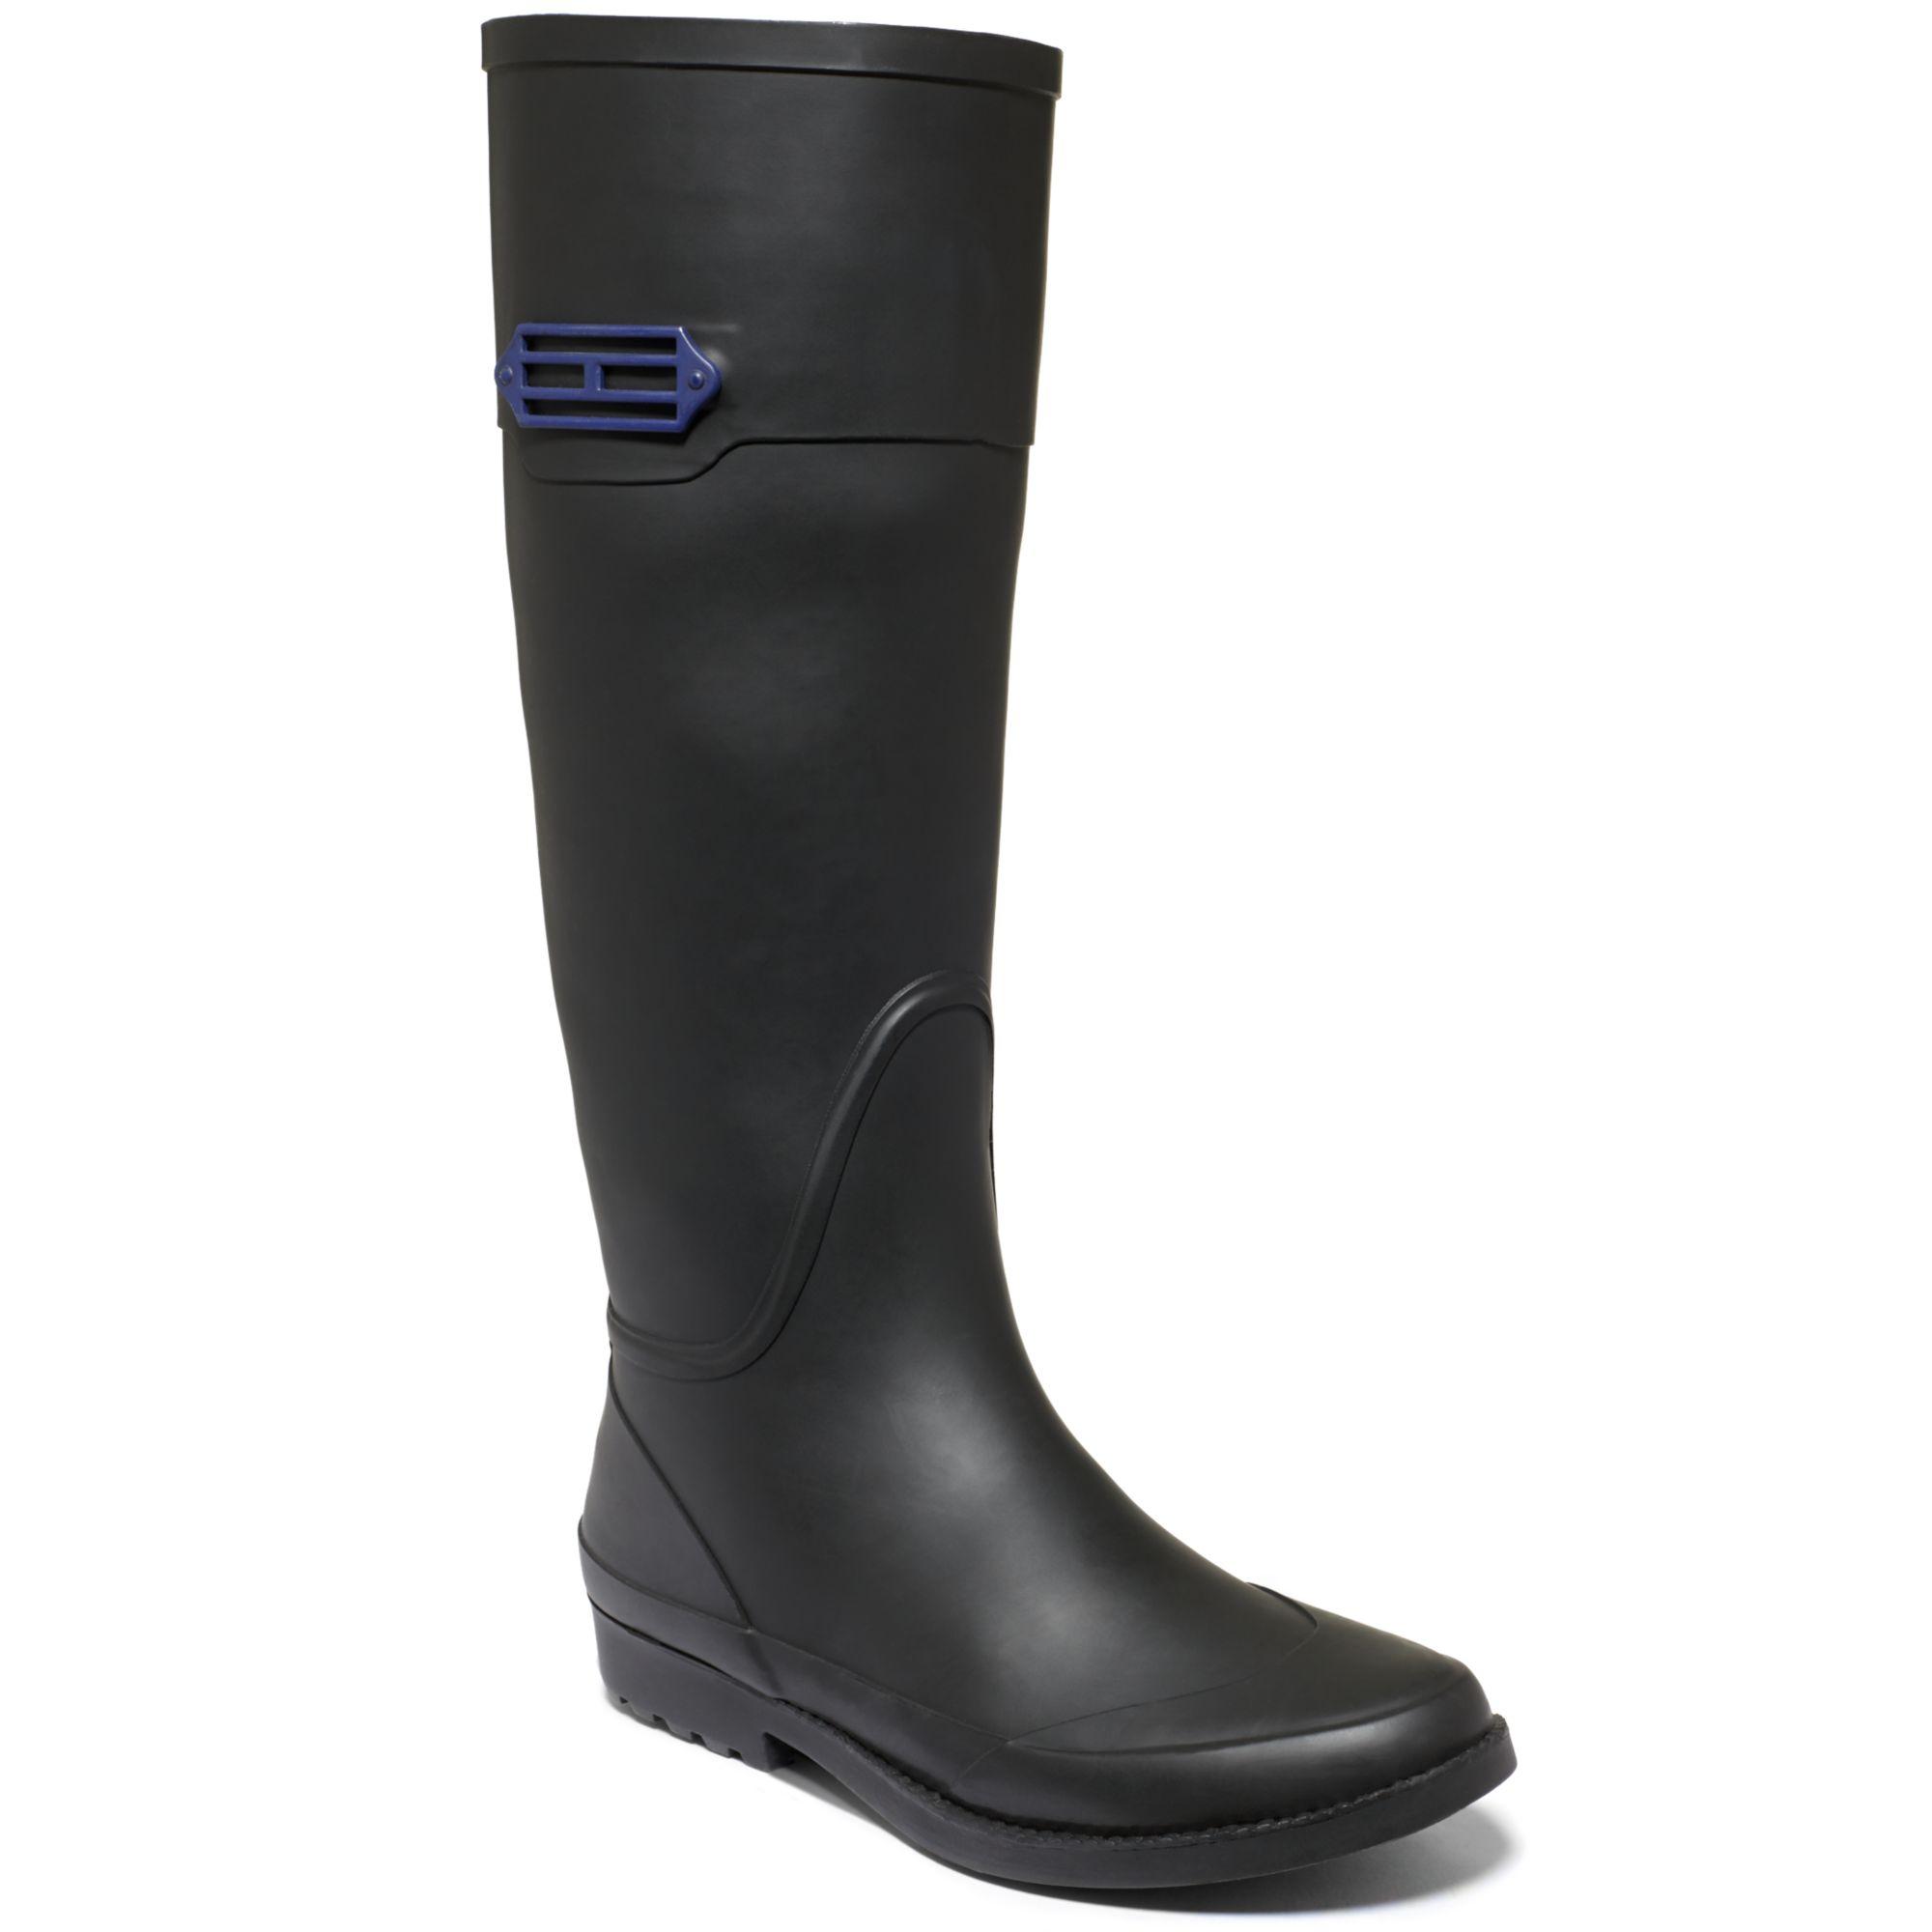 Tommy Hilfiger Coastal Rain Boots In Black - Lyst-8989